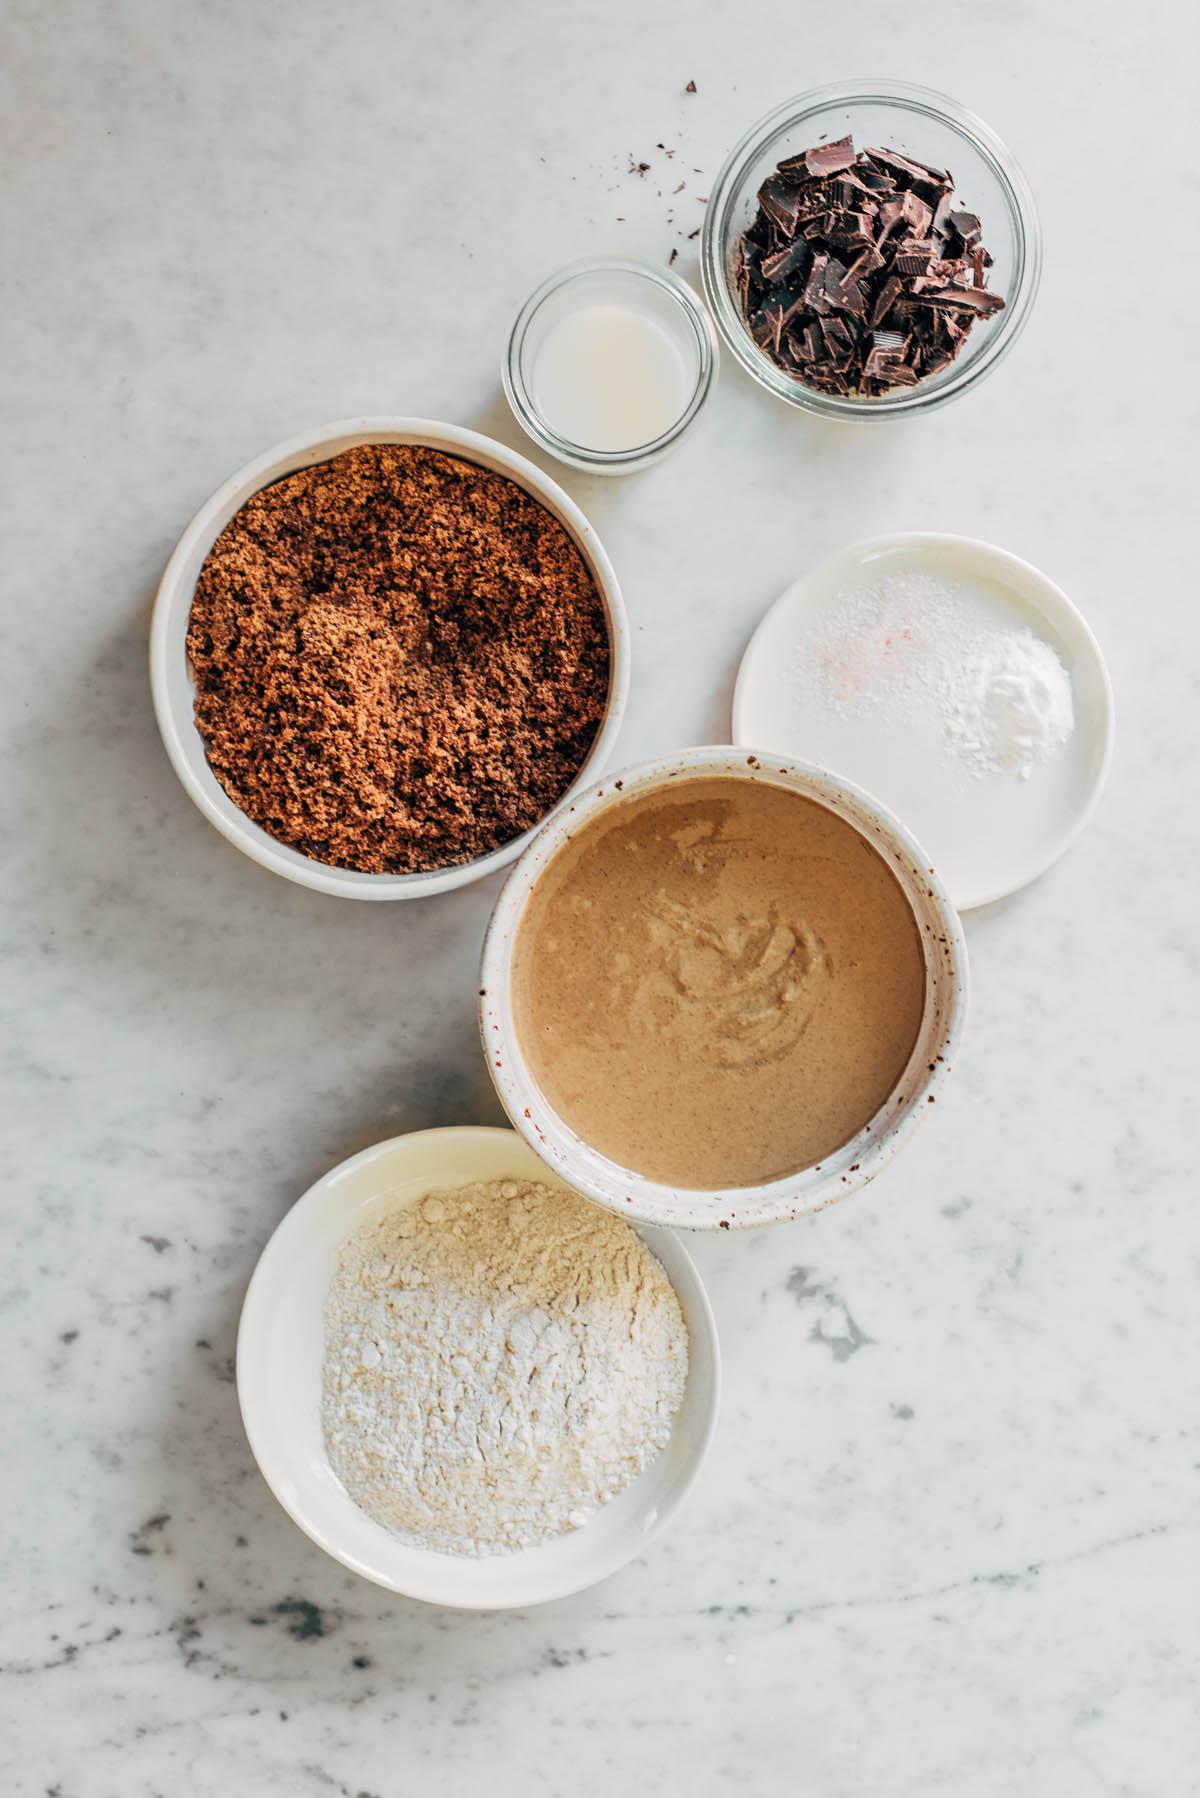 Chocolate tahini cookie ingredients: tahini, oat flour, chocolate chunks, brown sugar, salt, baking soda, and milk.